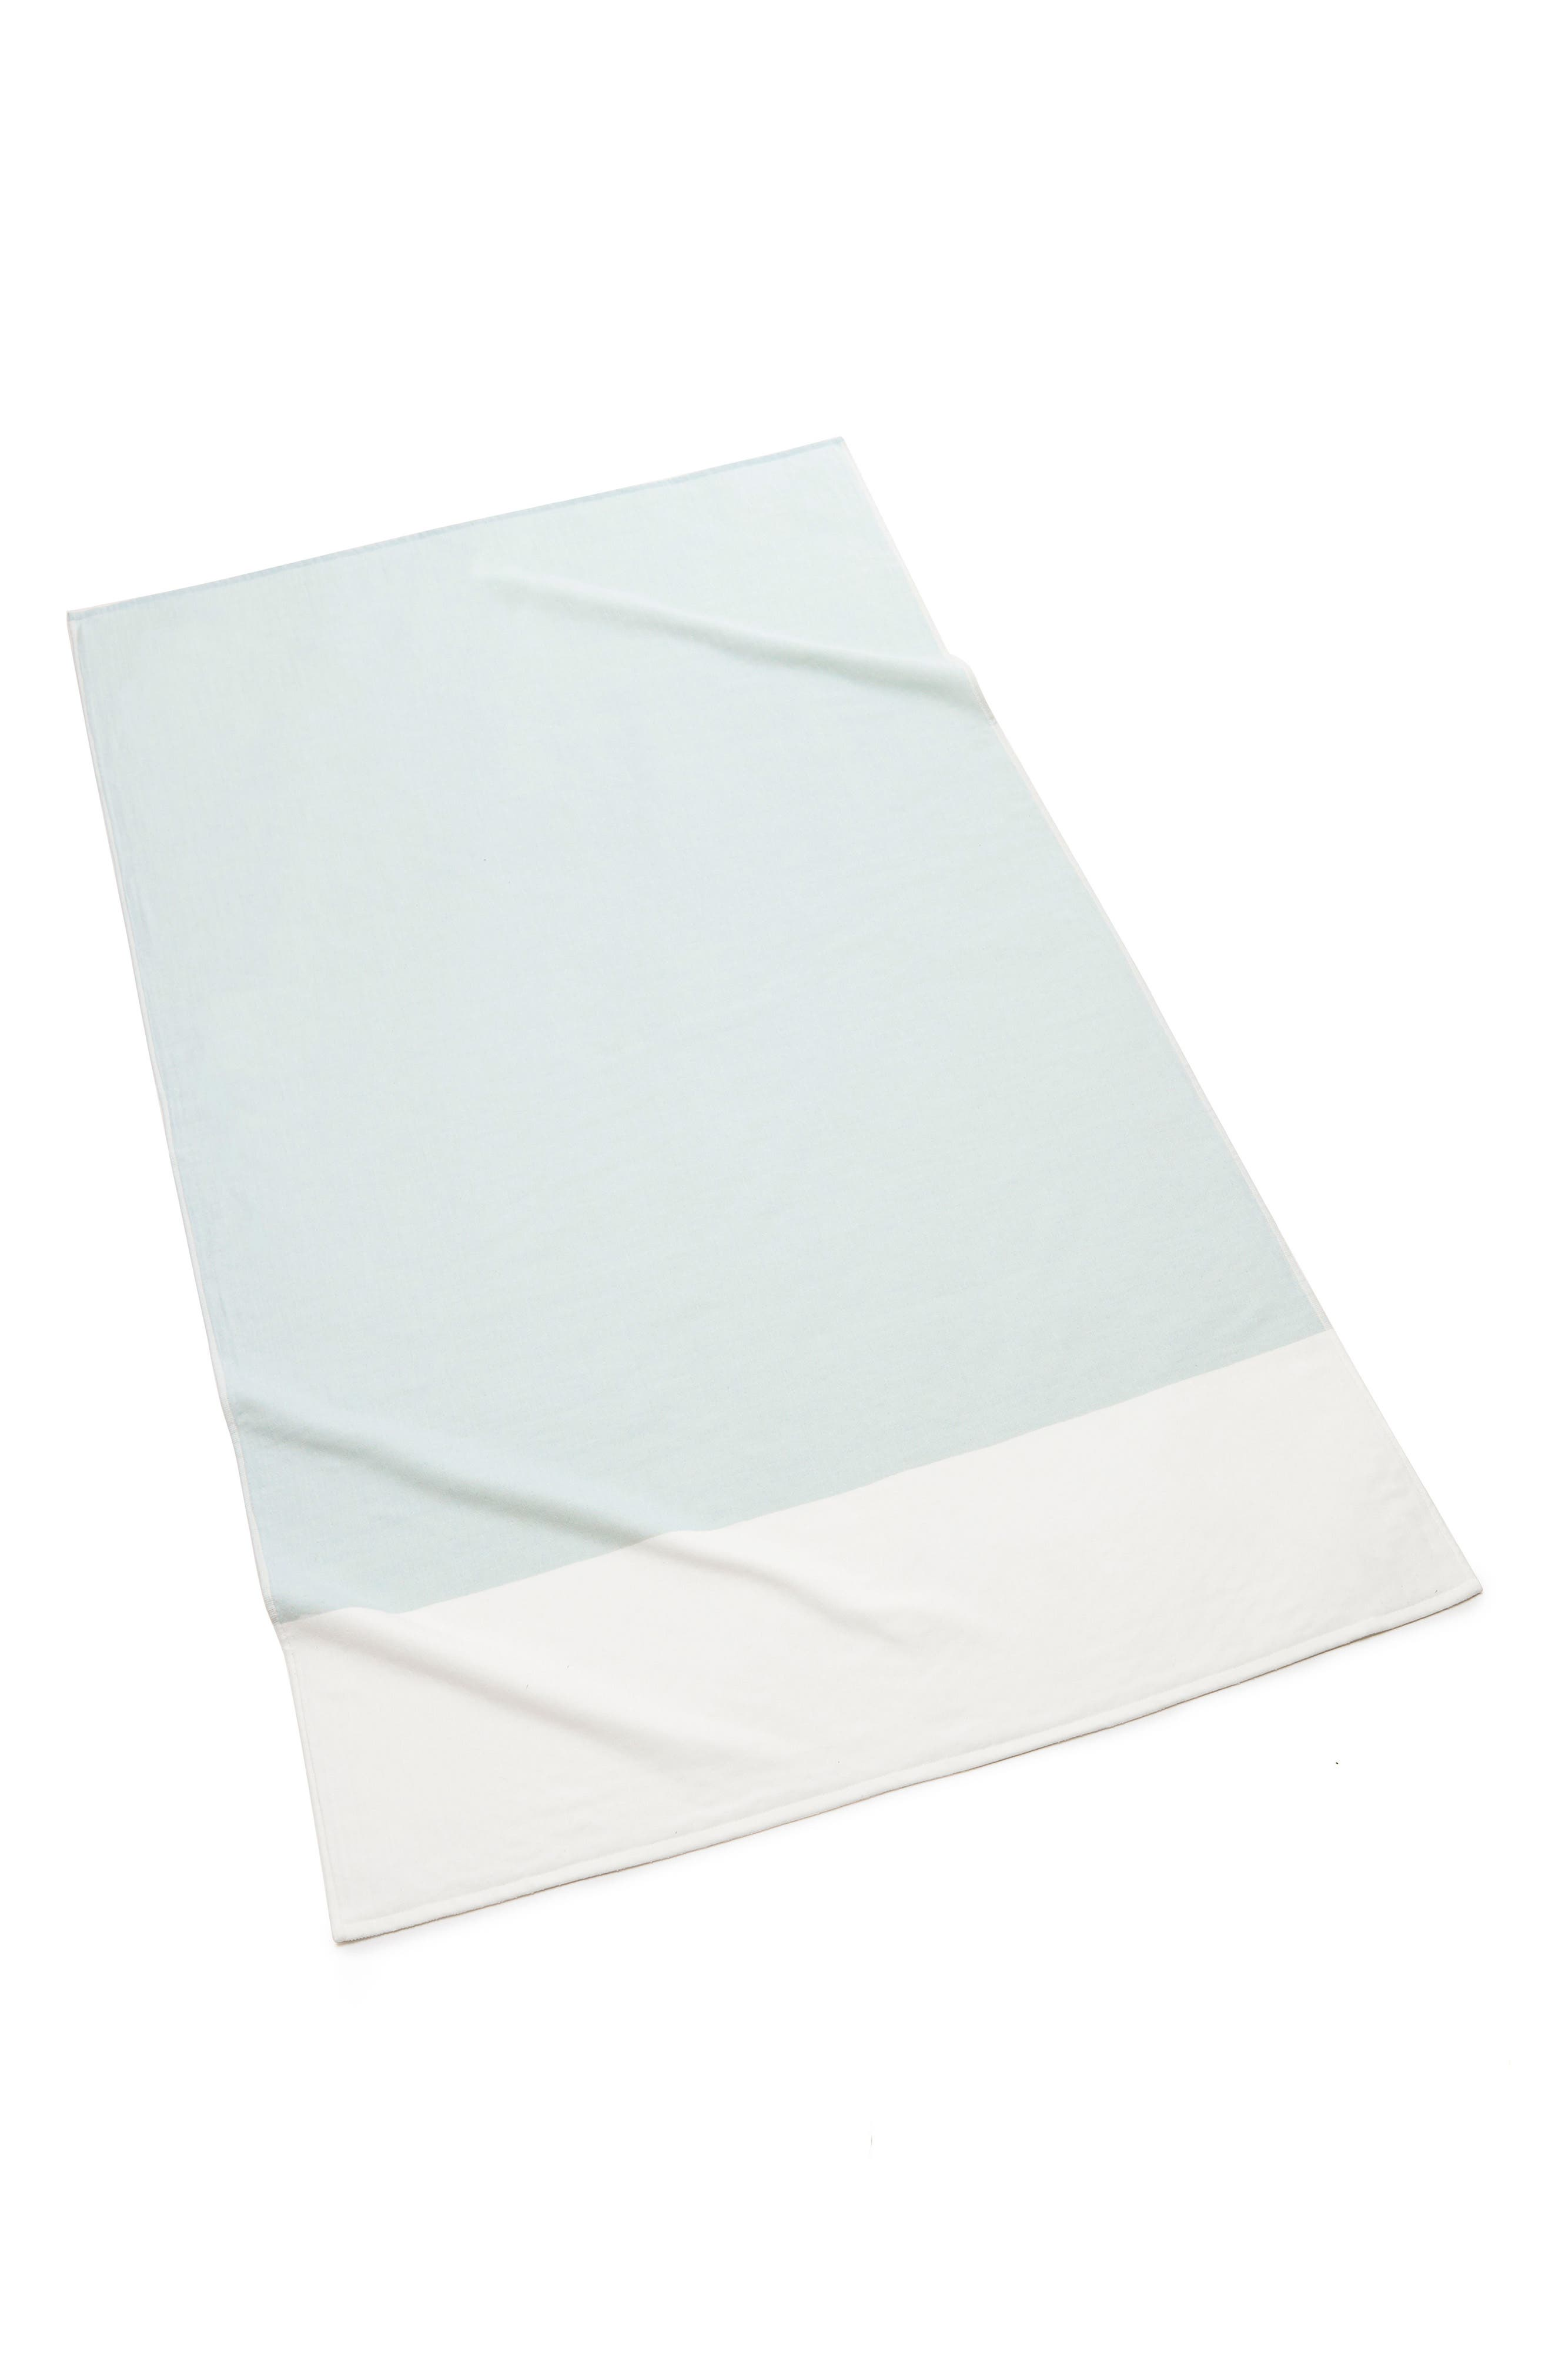 Alternate Image 1 Selected - KASSATEX Block Pareo Beach Towel